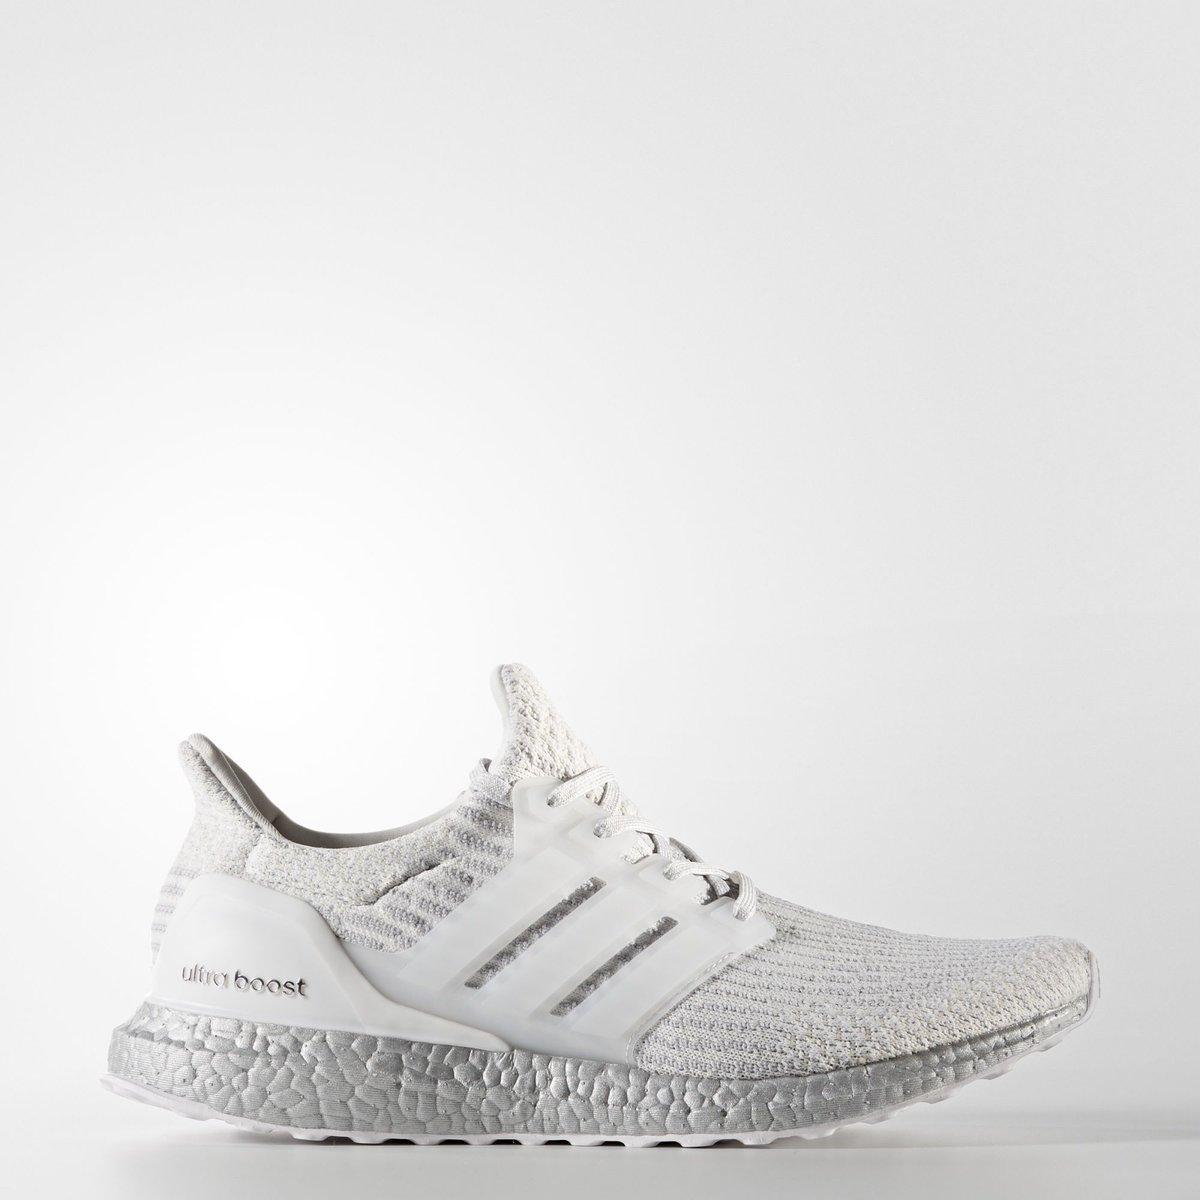 uk availability 7bf95 8dd25 adidas ultra boost white lazada